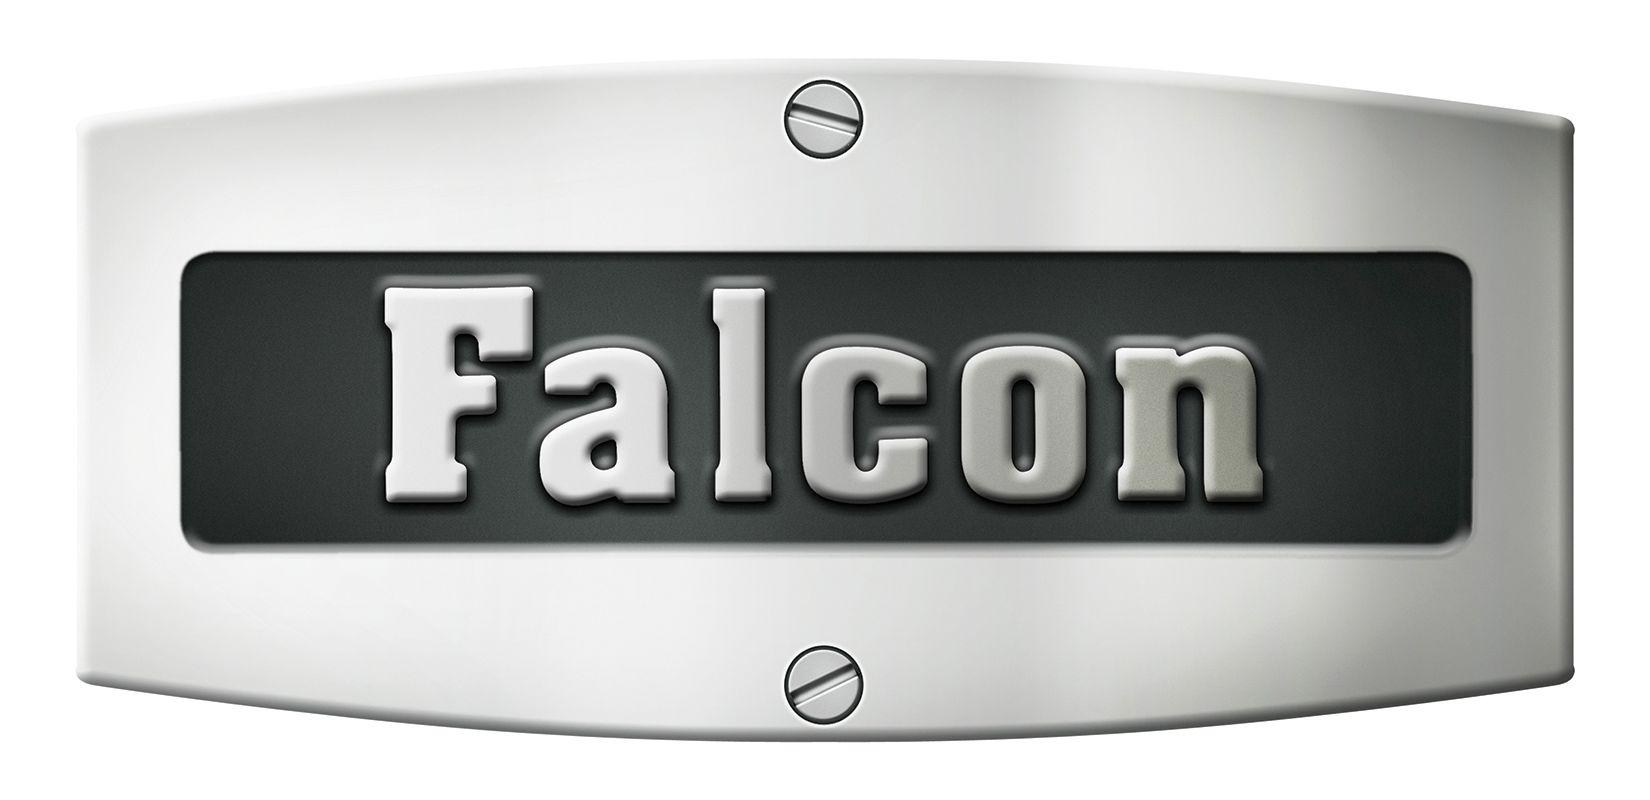 Falcon Repairs Washing Machine Dishwasher Oven Cooker